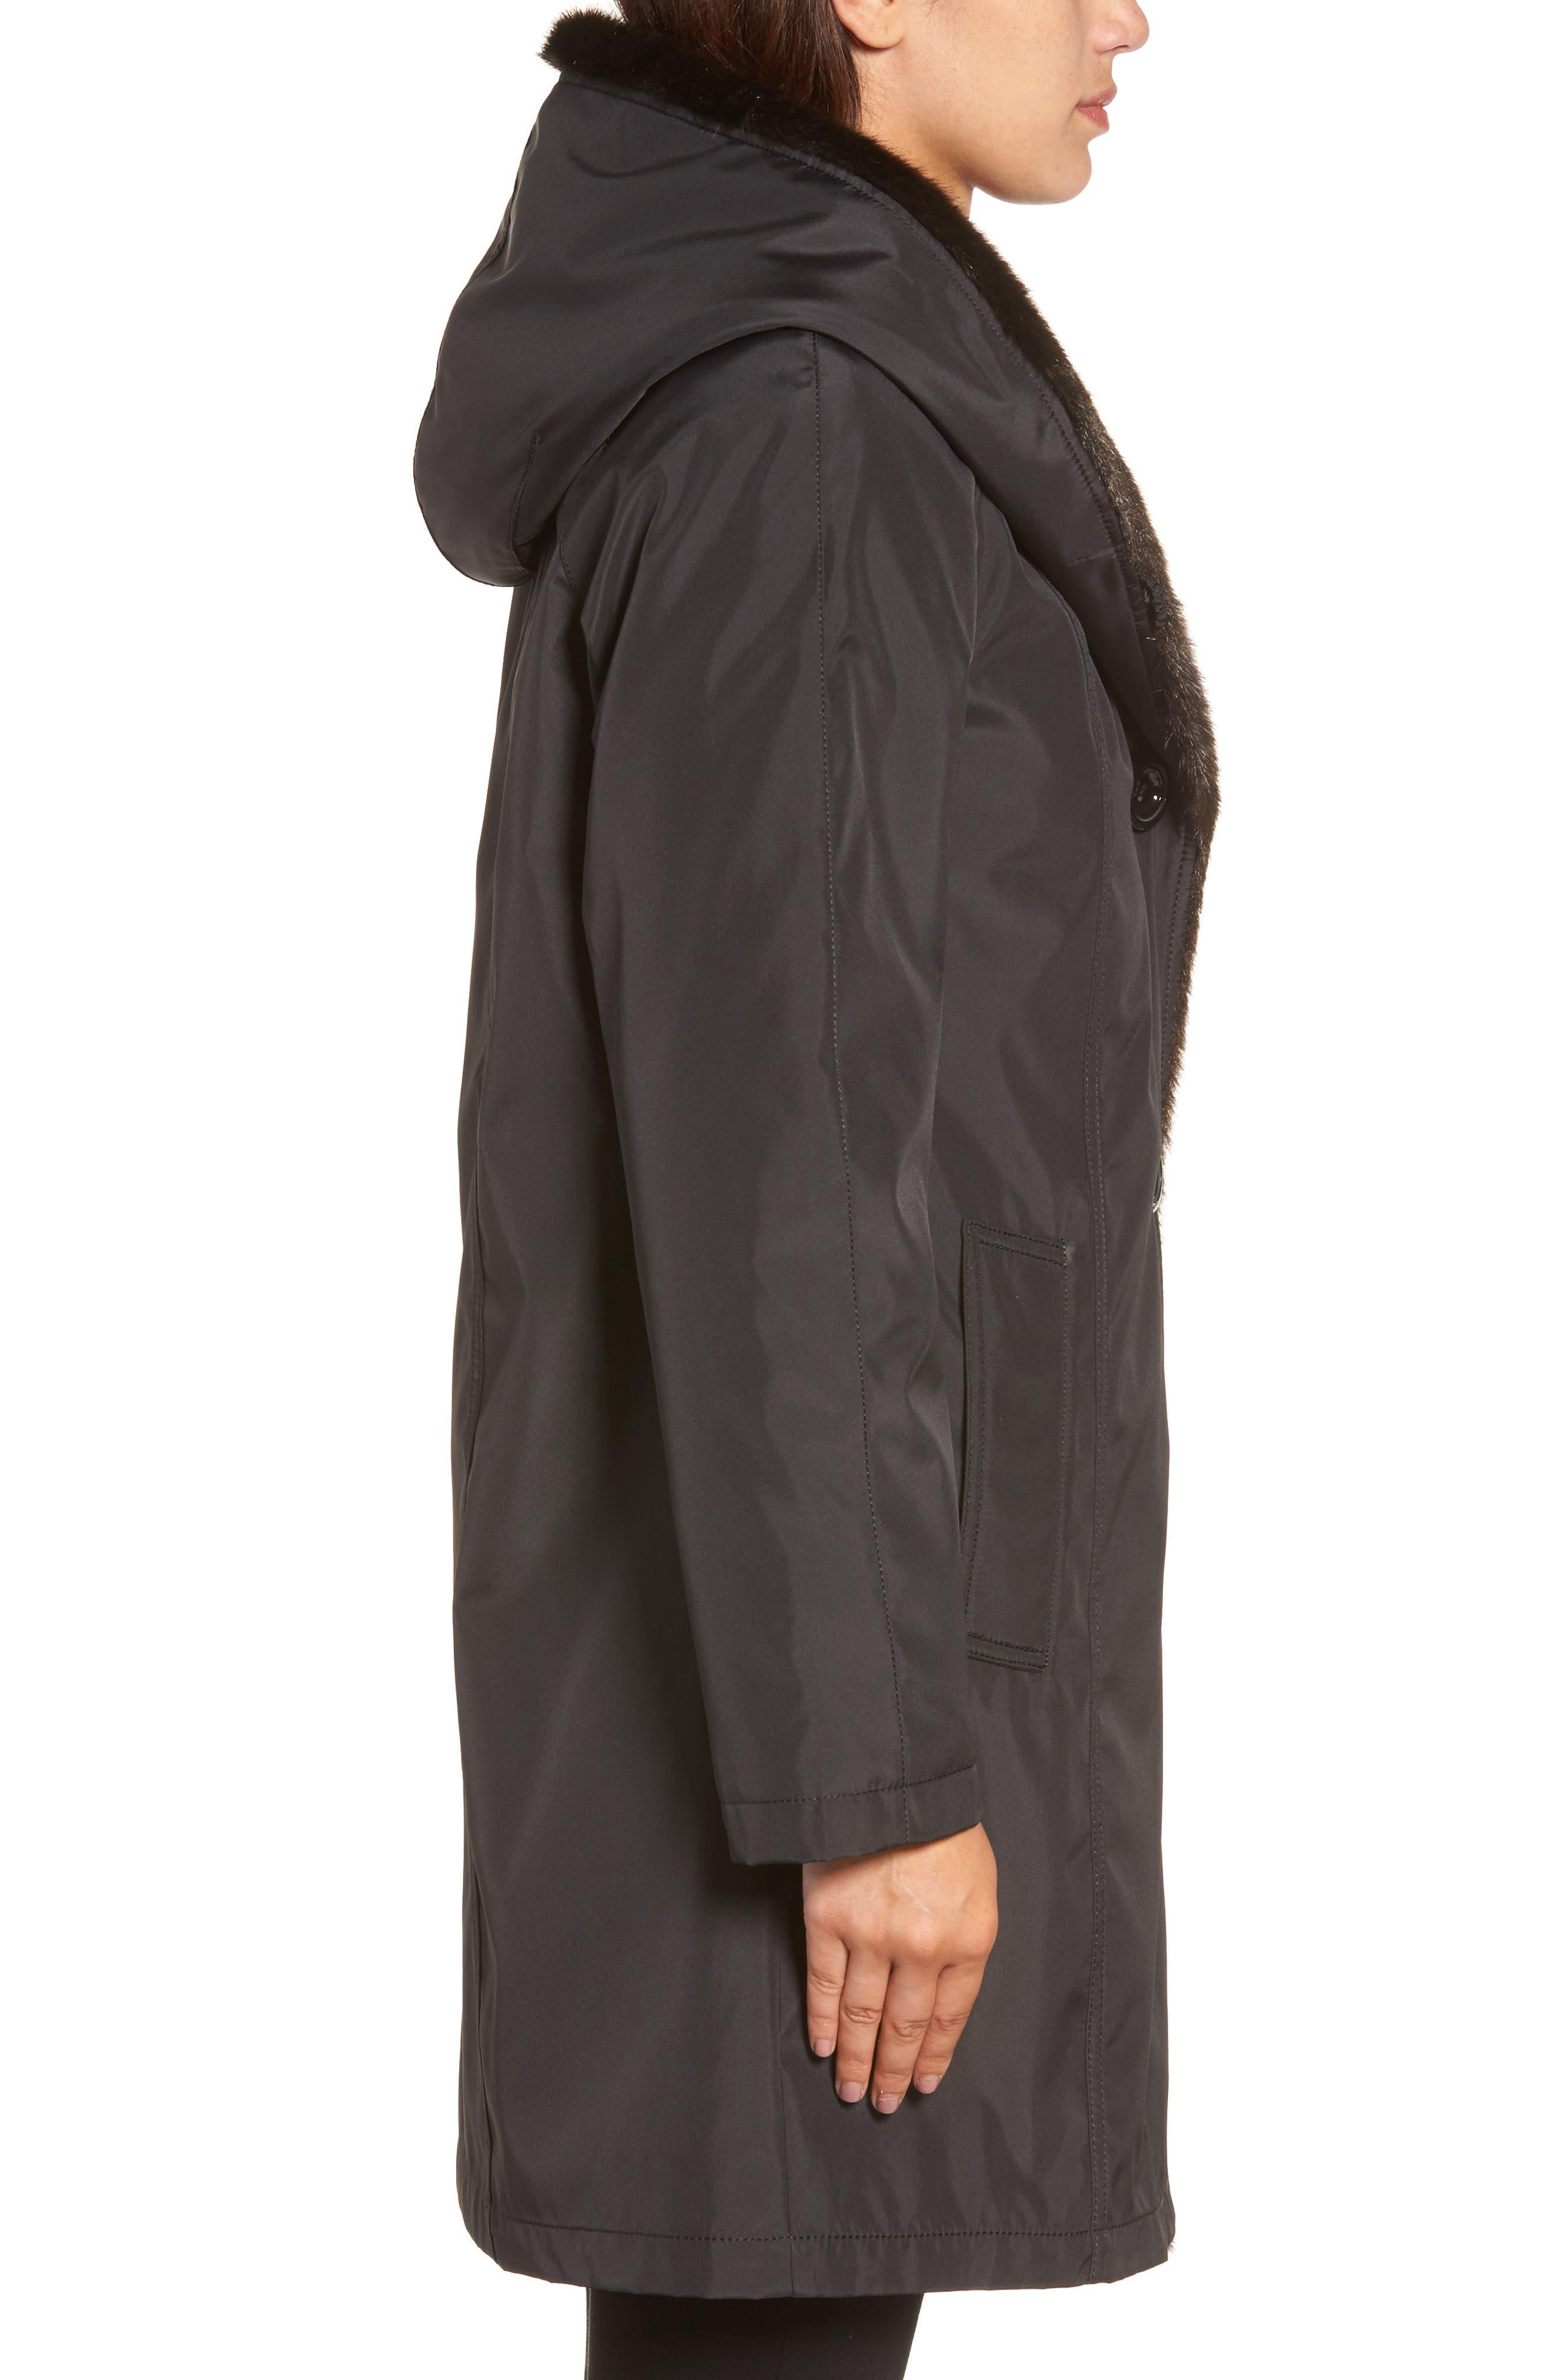 Storm Coat with Faux Fur Trim & Lining,                             Alternate thumbnail 3, color,                             001